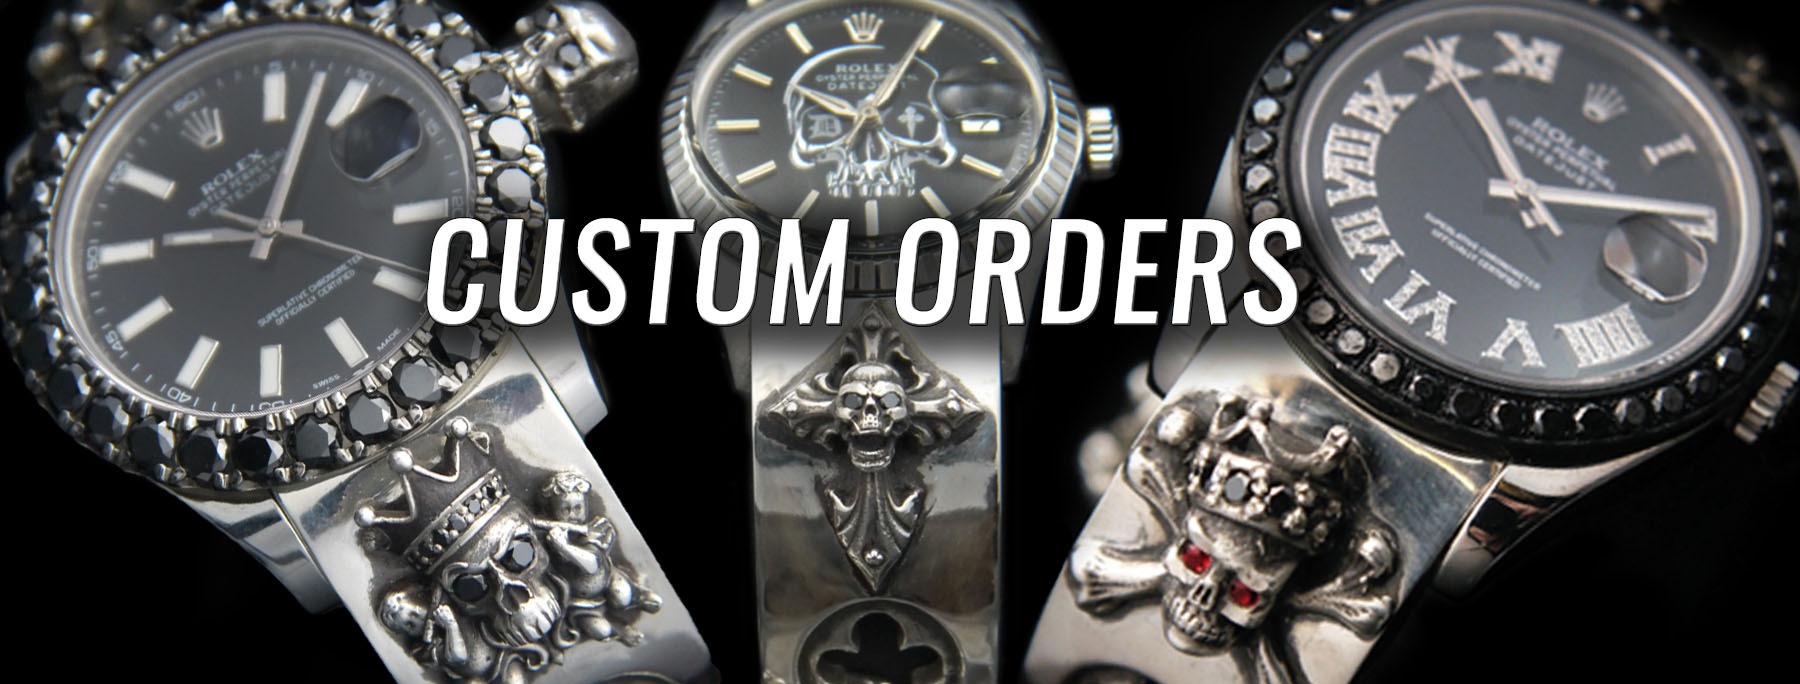 custom-orders-banner.jpg